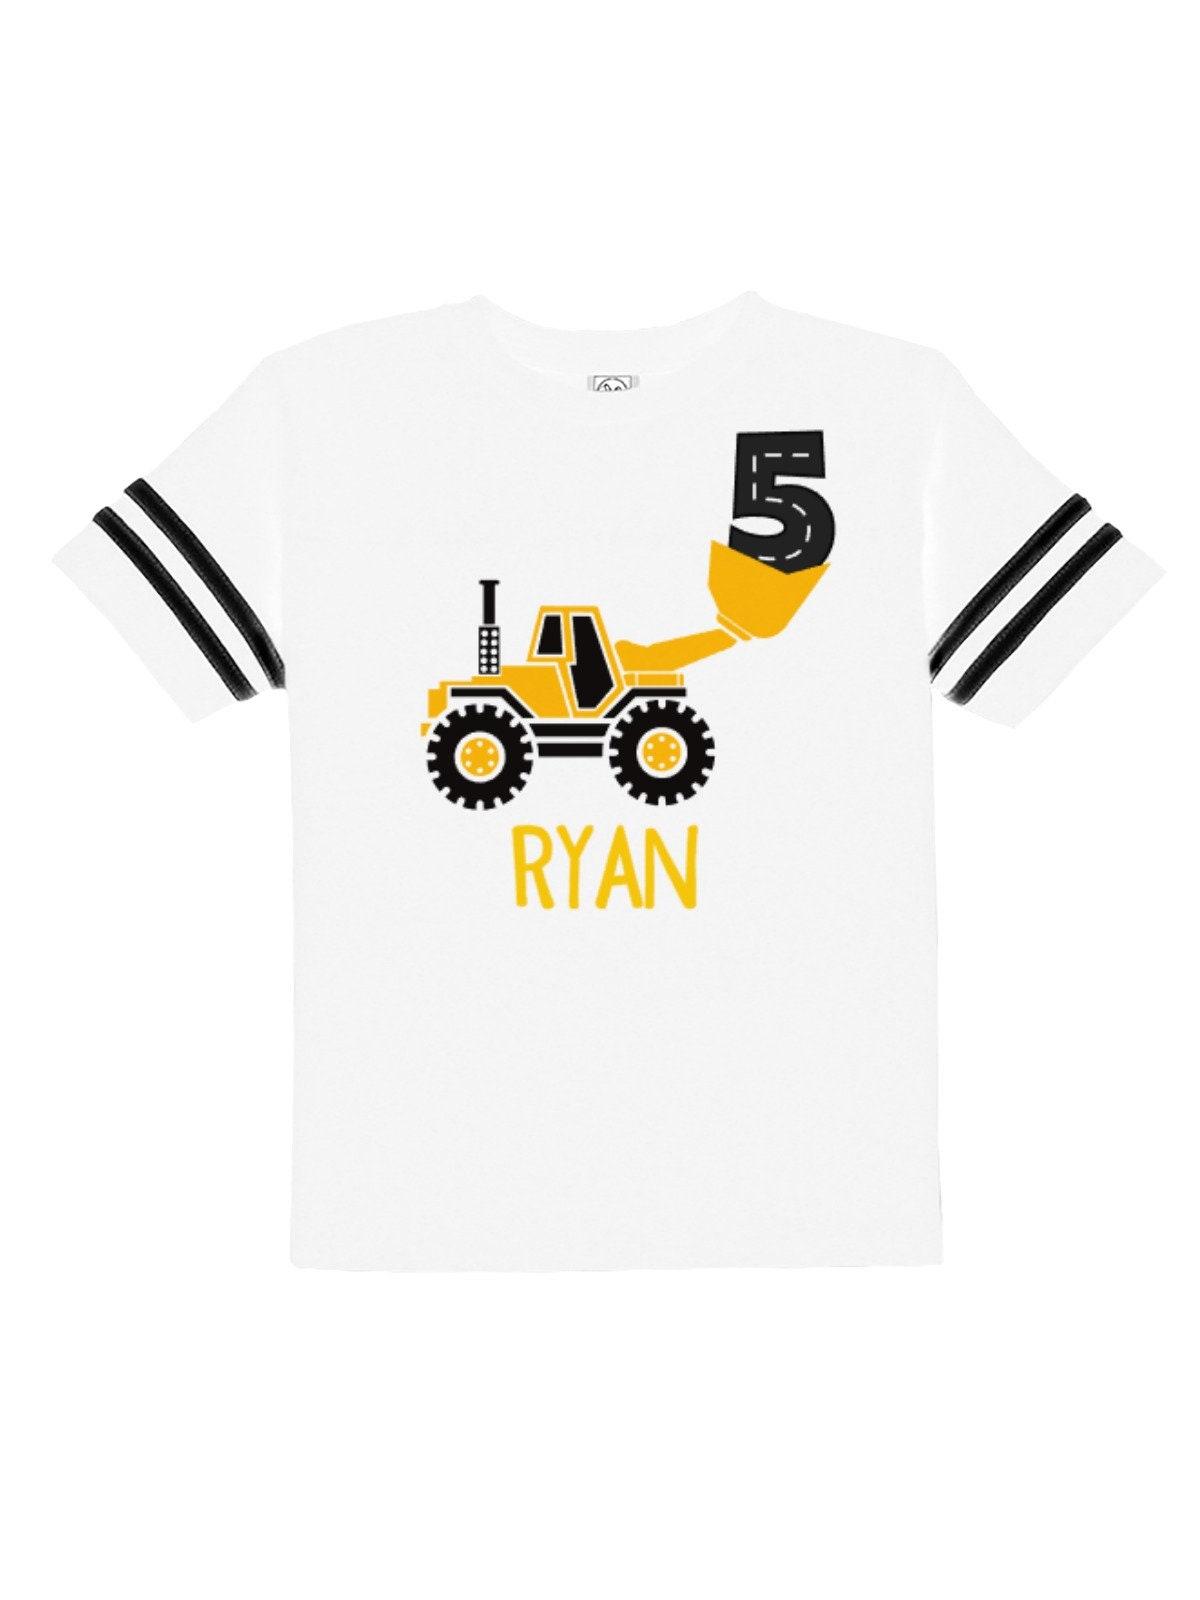 5th Birthday Construction Party Shirt - Personalized Yellow Tractor Shirt - Boys Birthday T-shirt - Football Jersey Style Bodysuit Unisex Tshirt